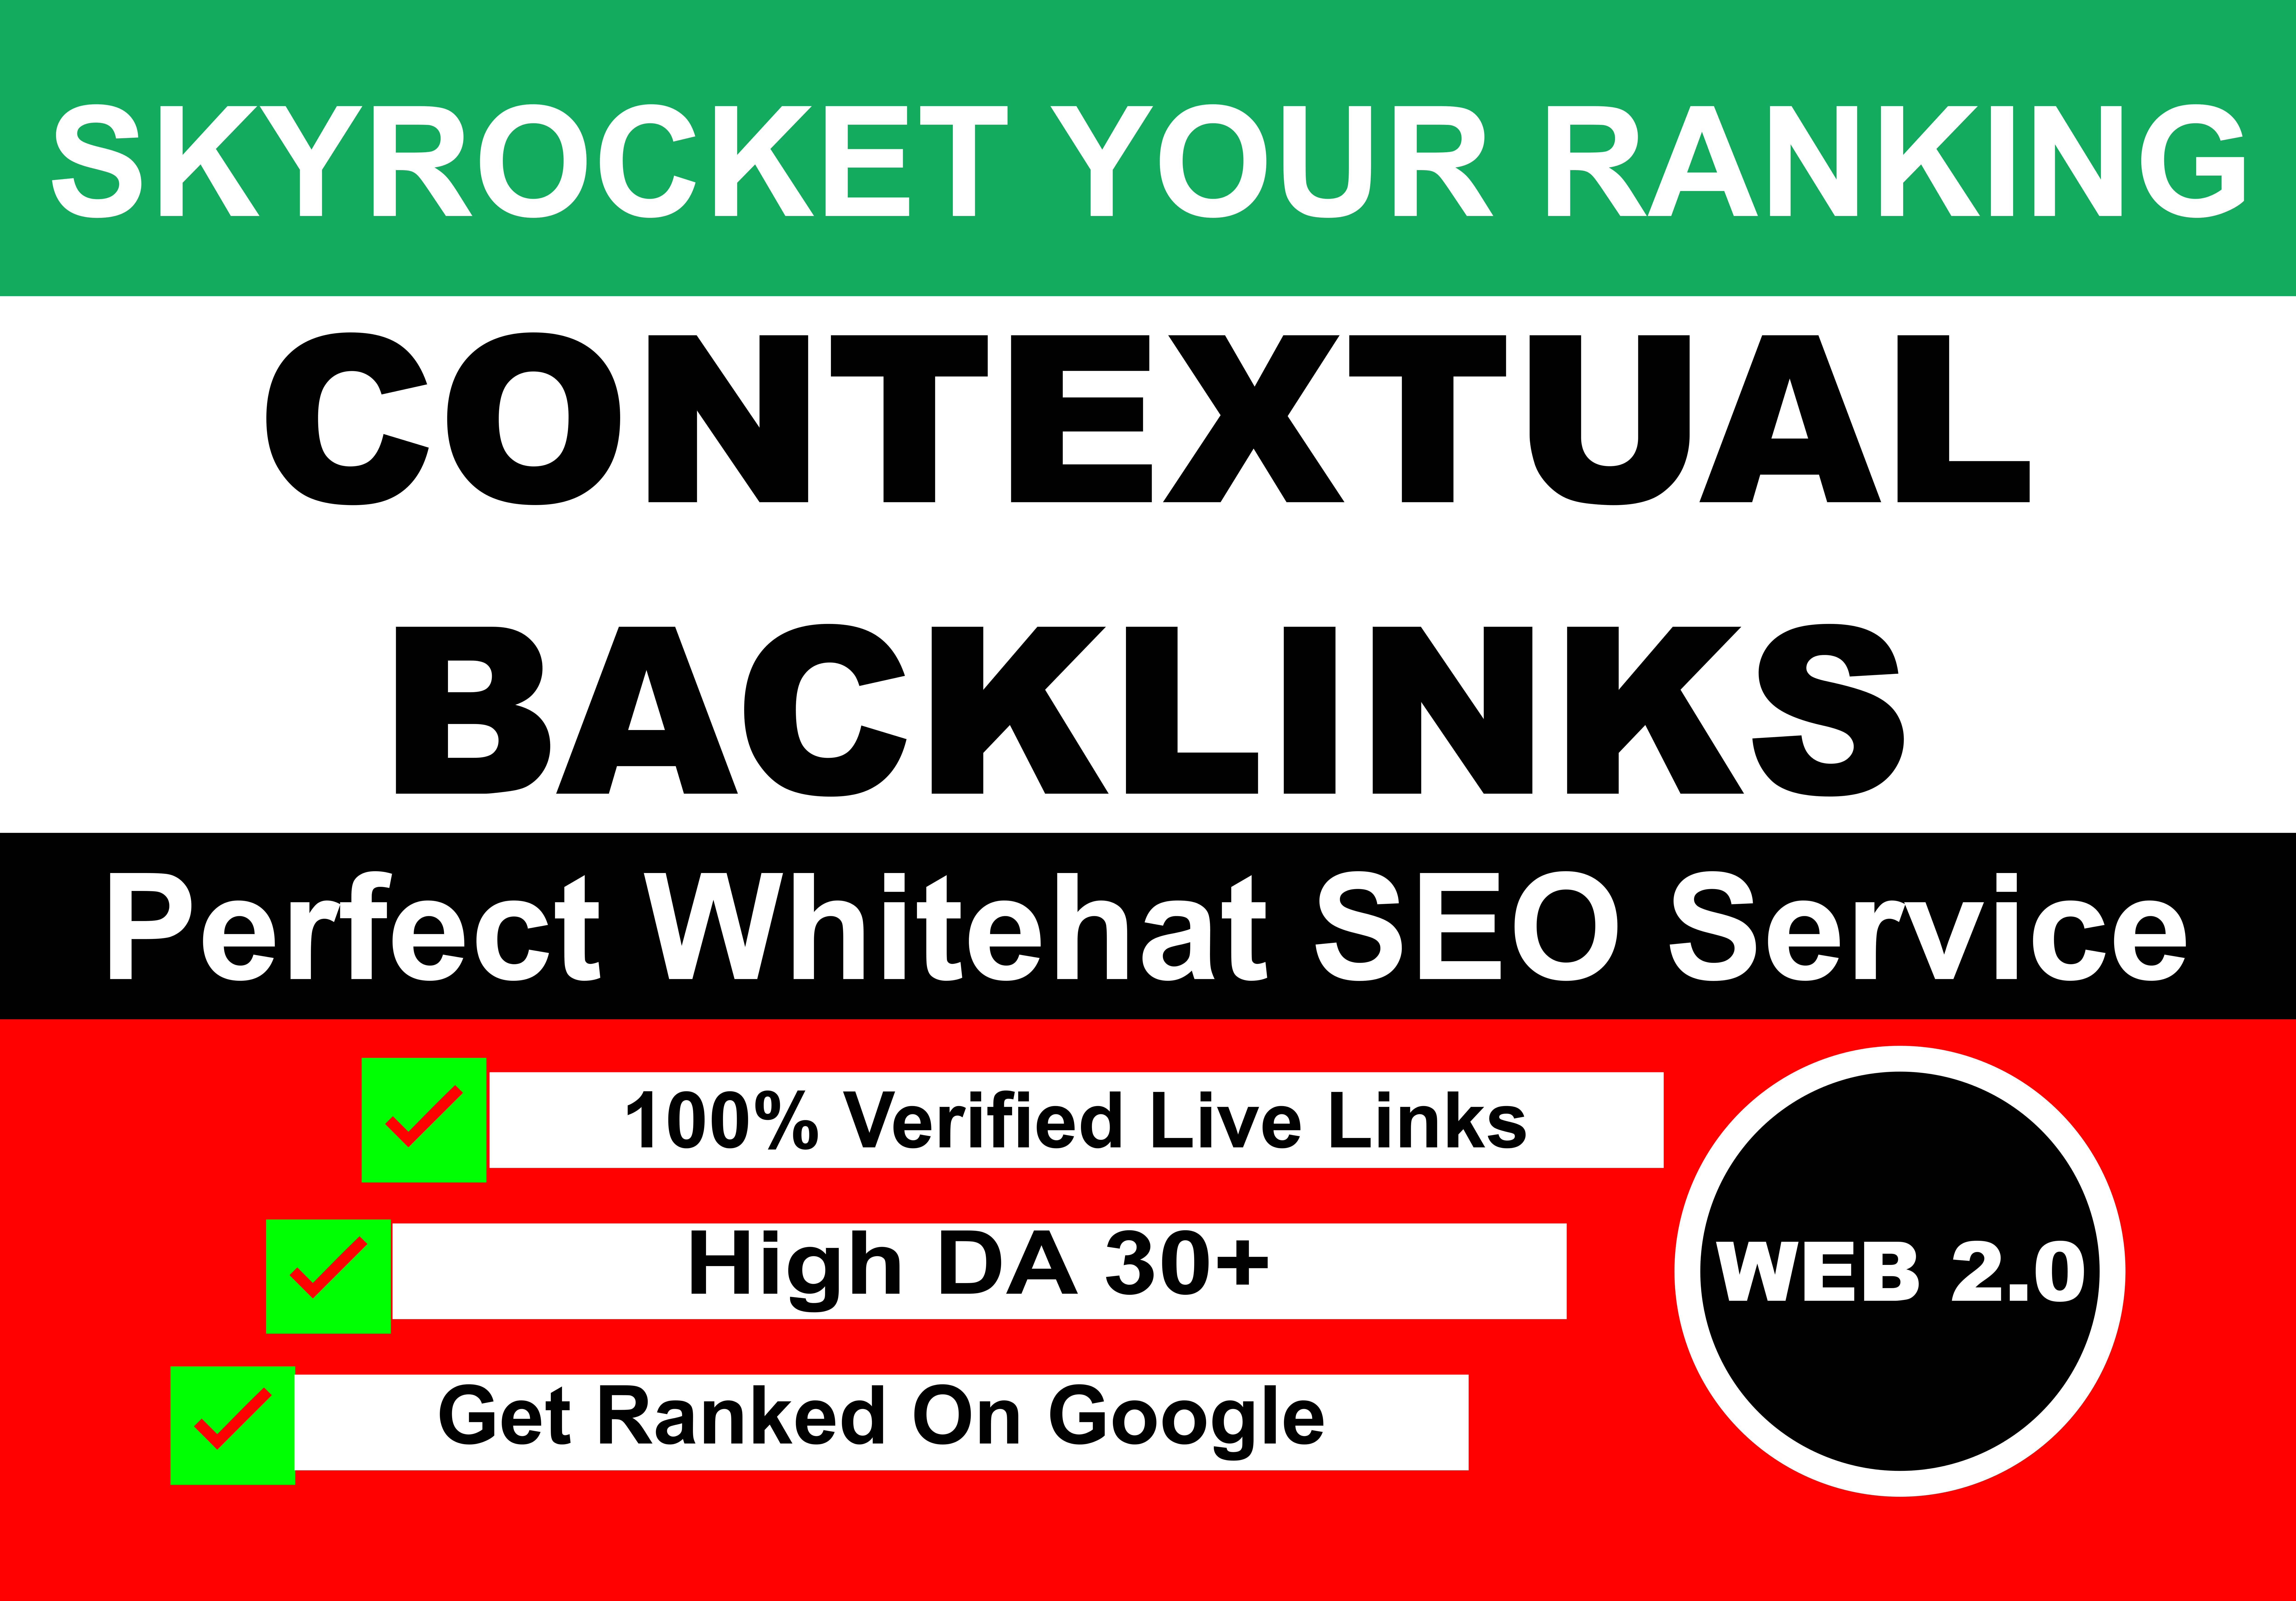 Rank Higher On Google With High Da Contextual Backlinks